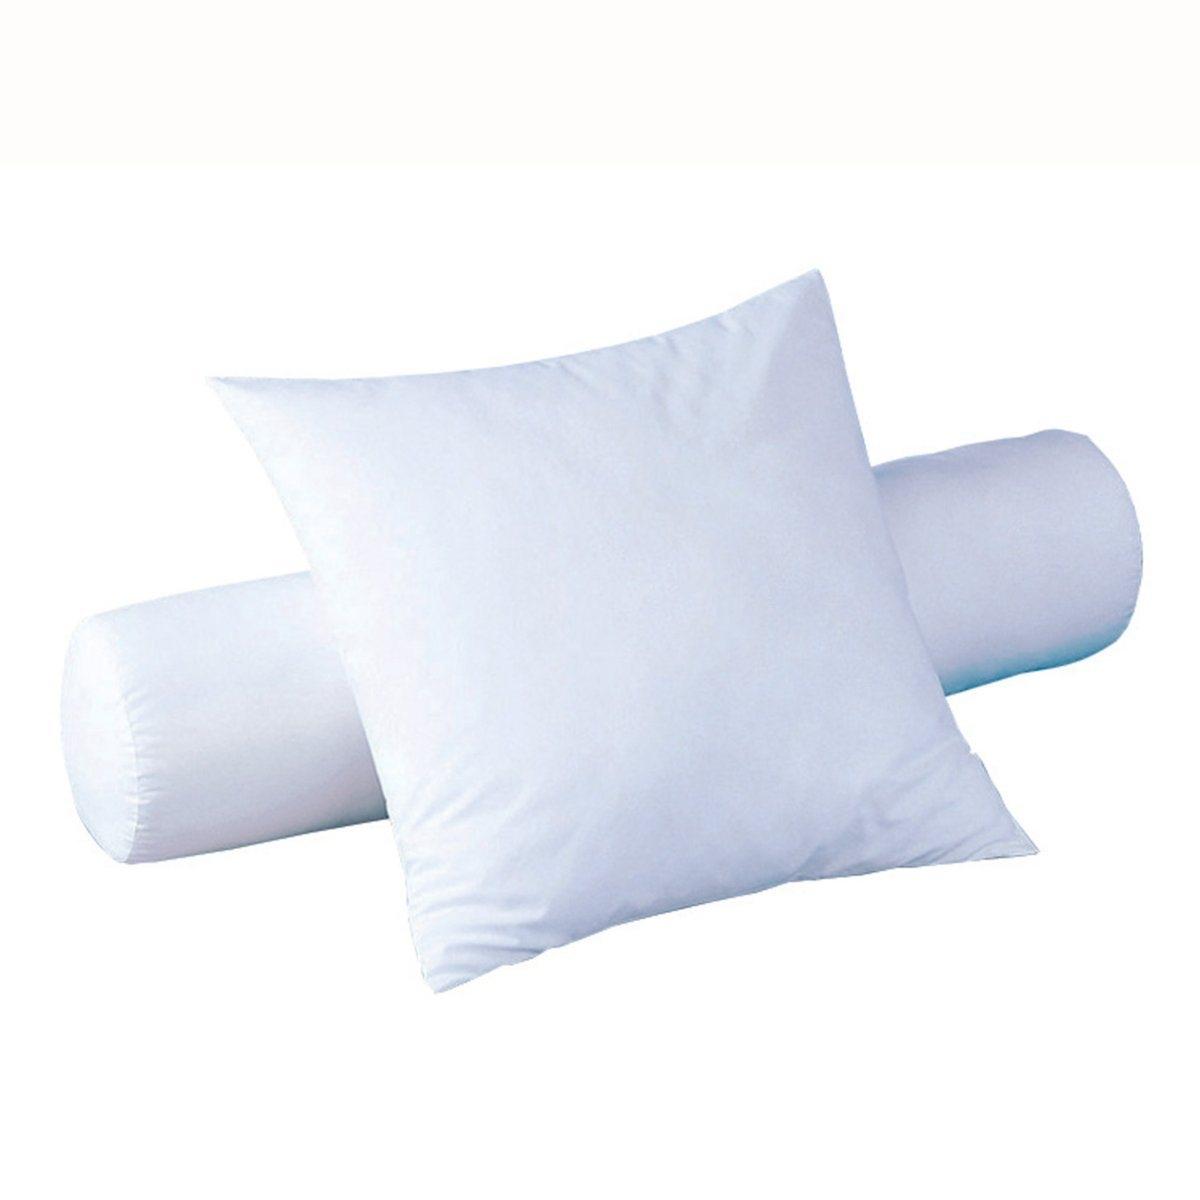 Подушка упругая из синтетики